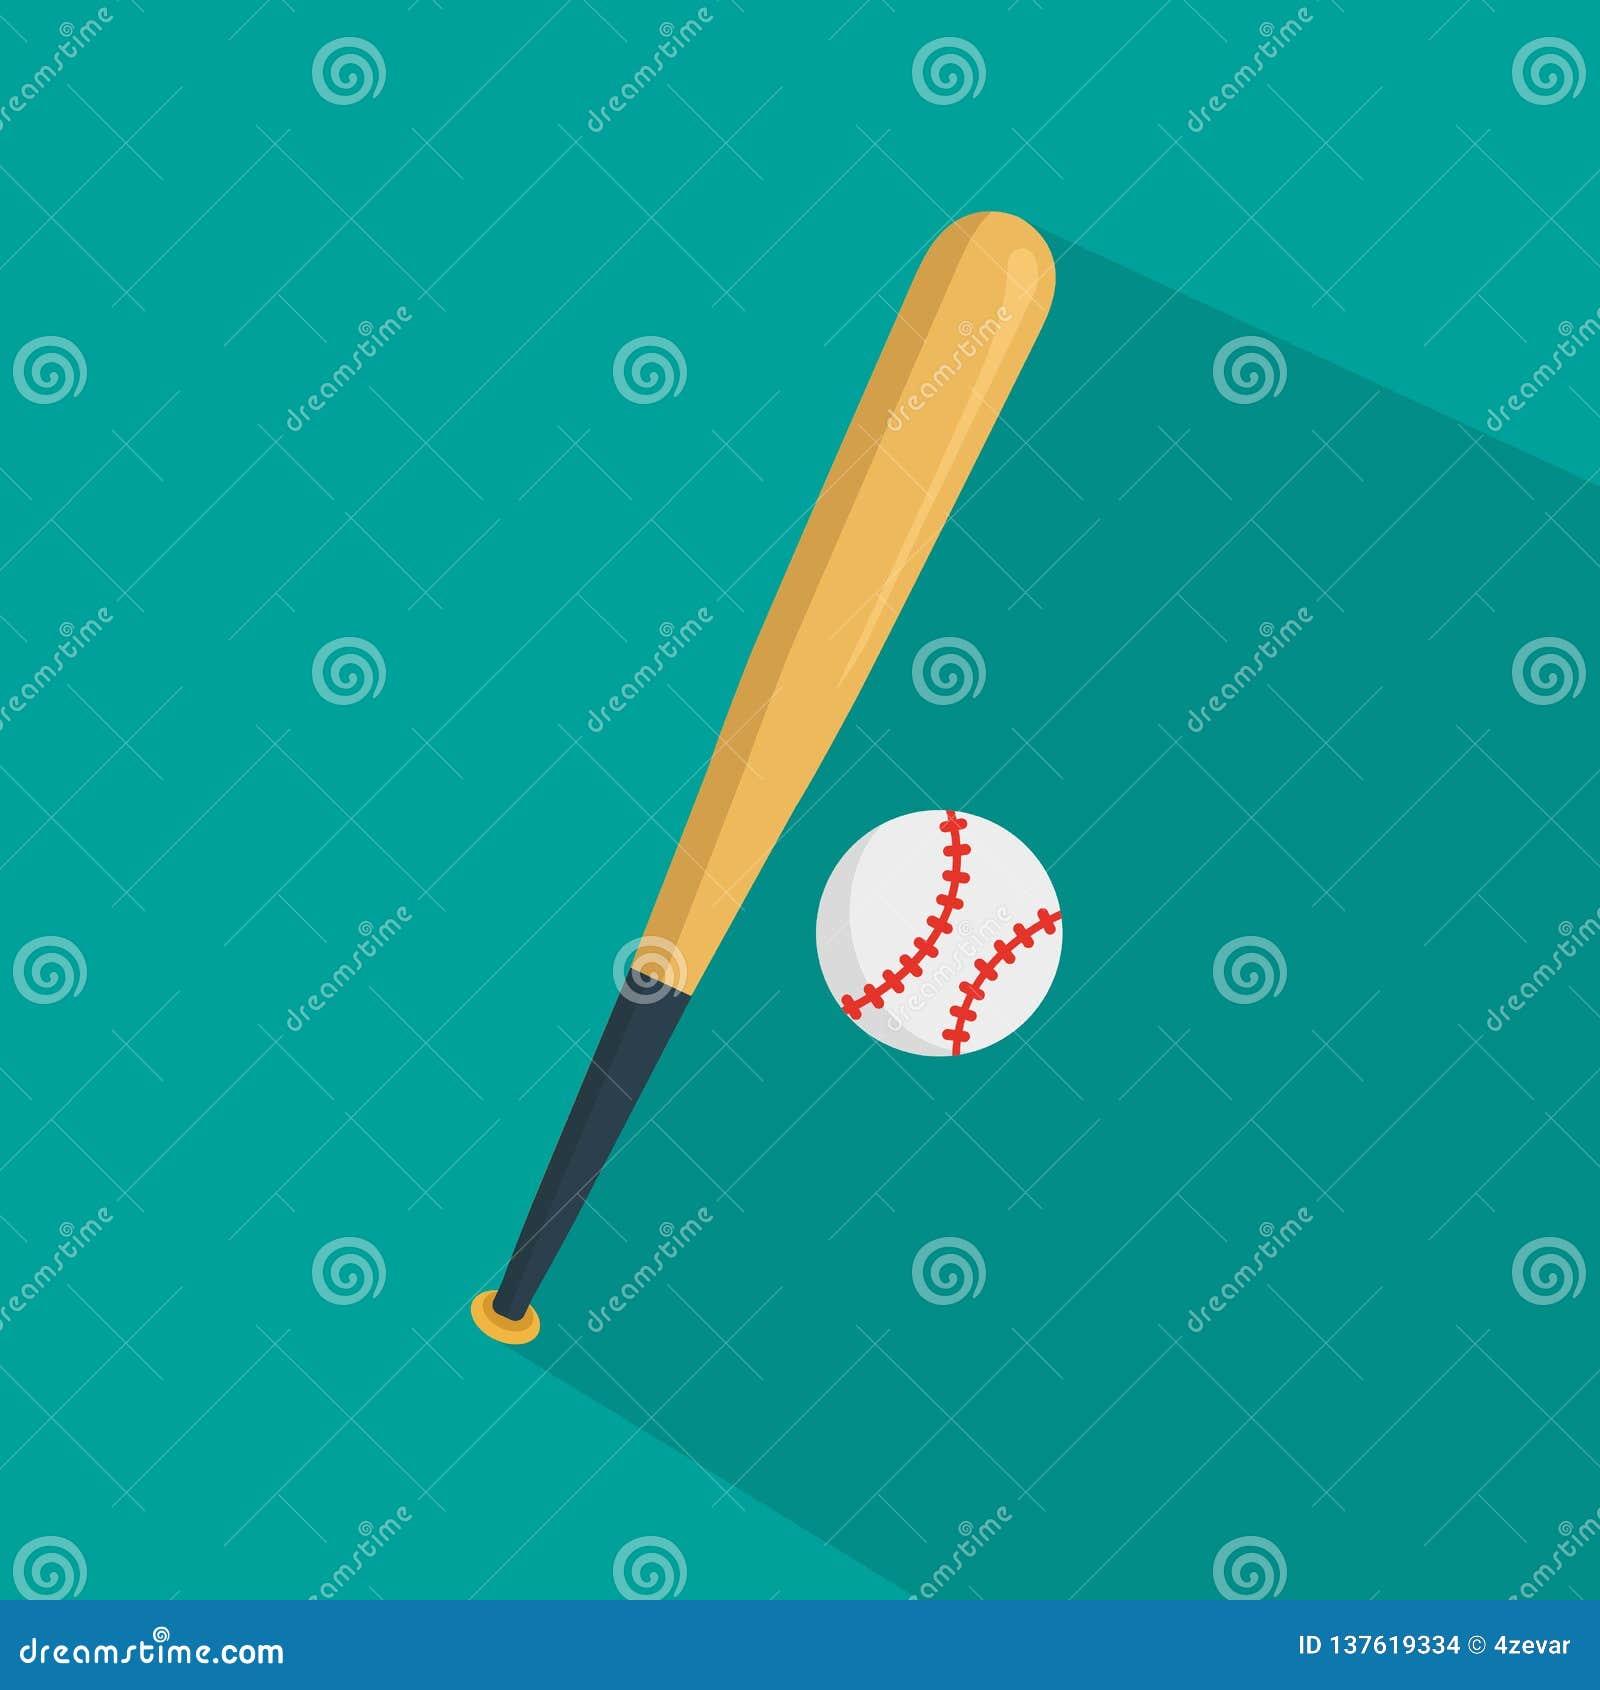 Vecteur d icône de base-ball